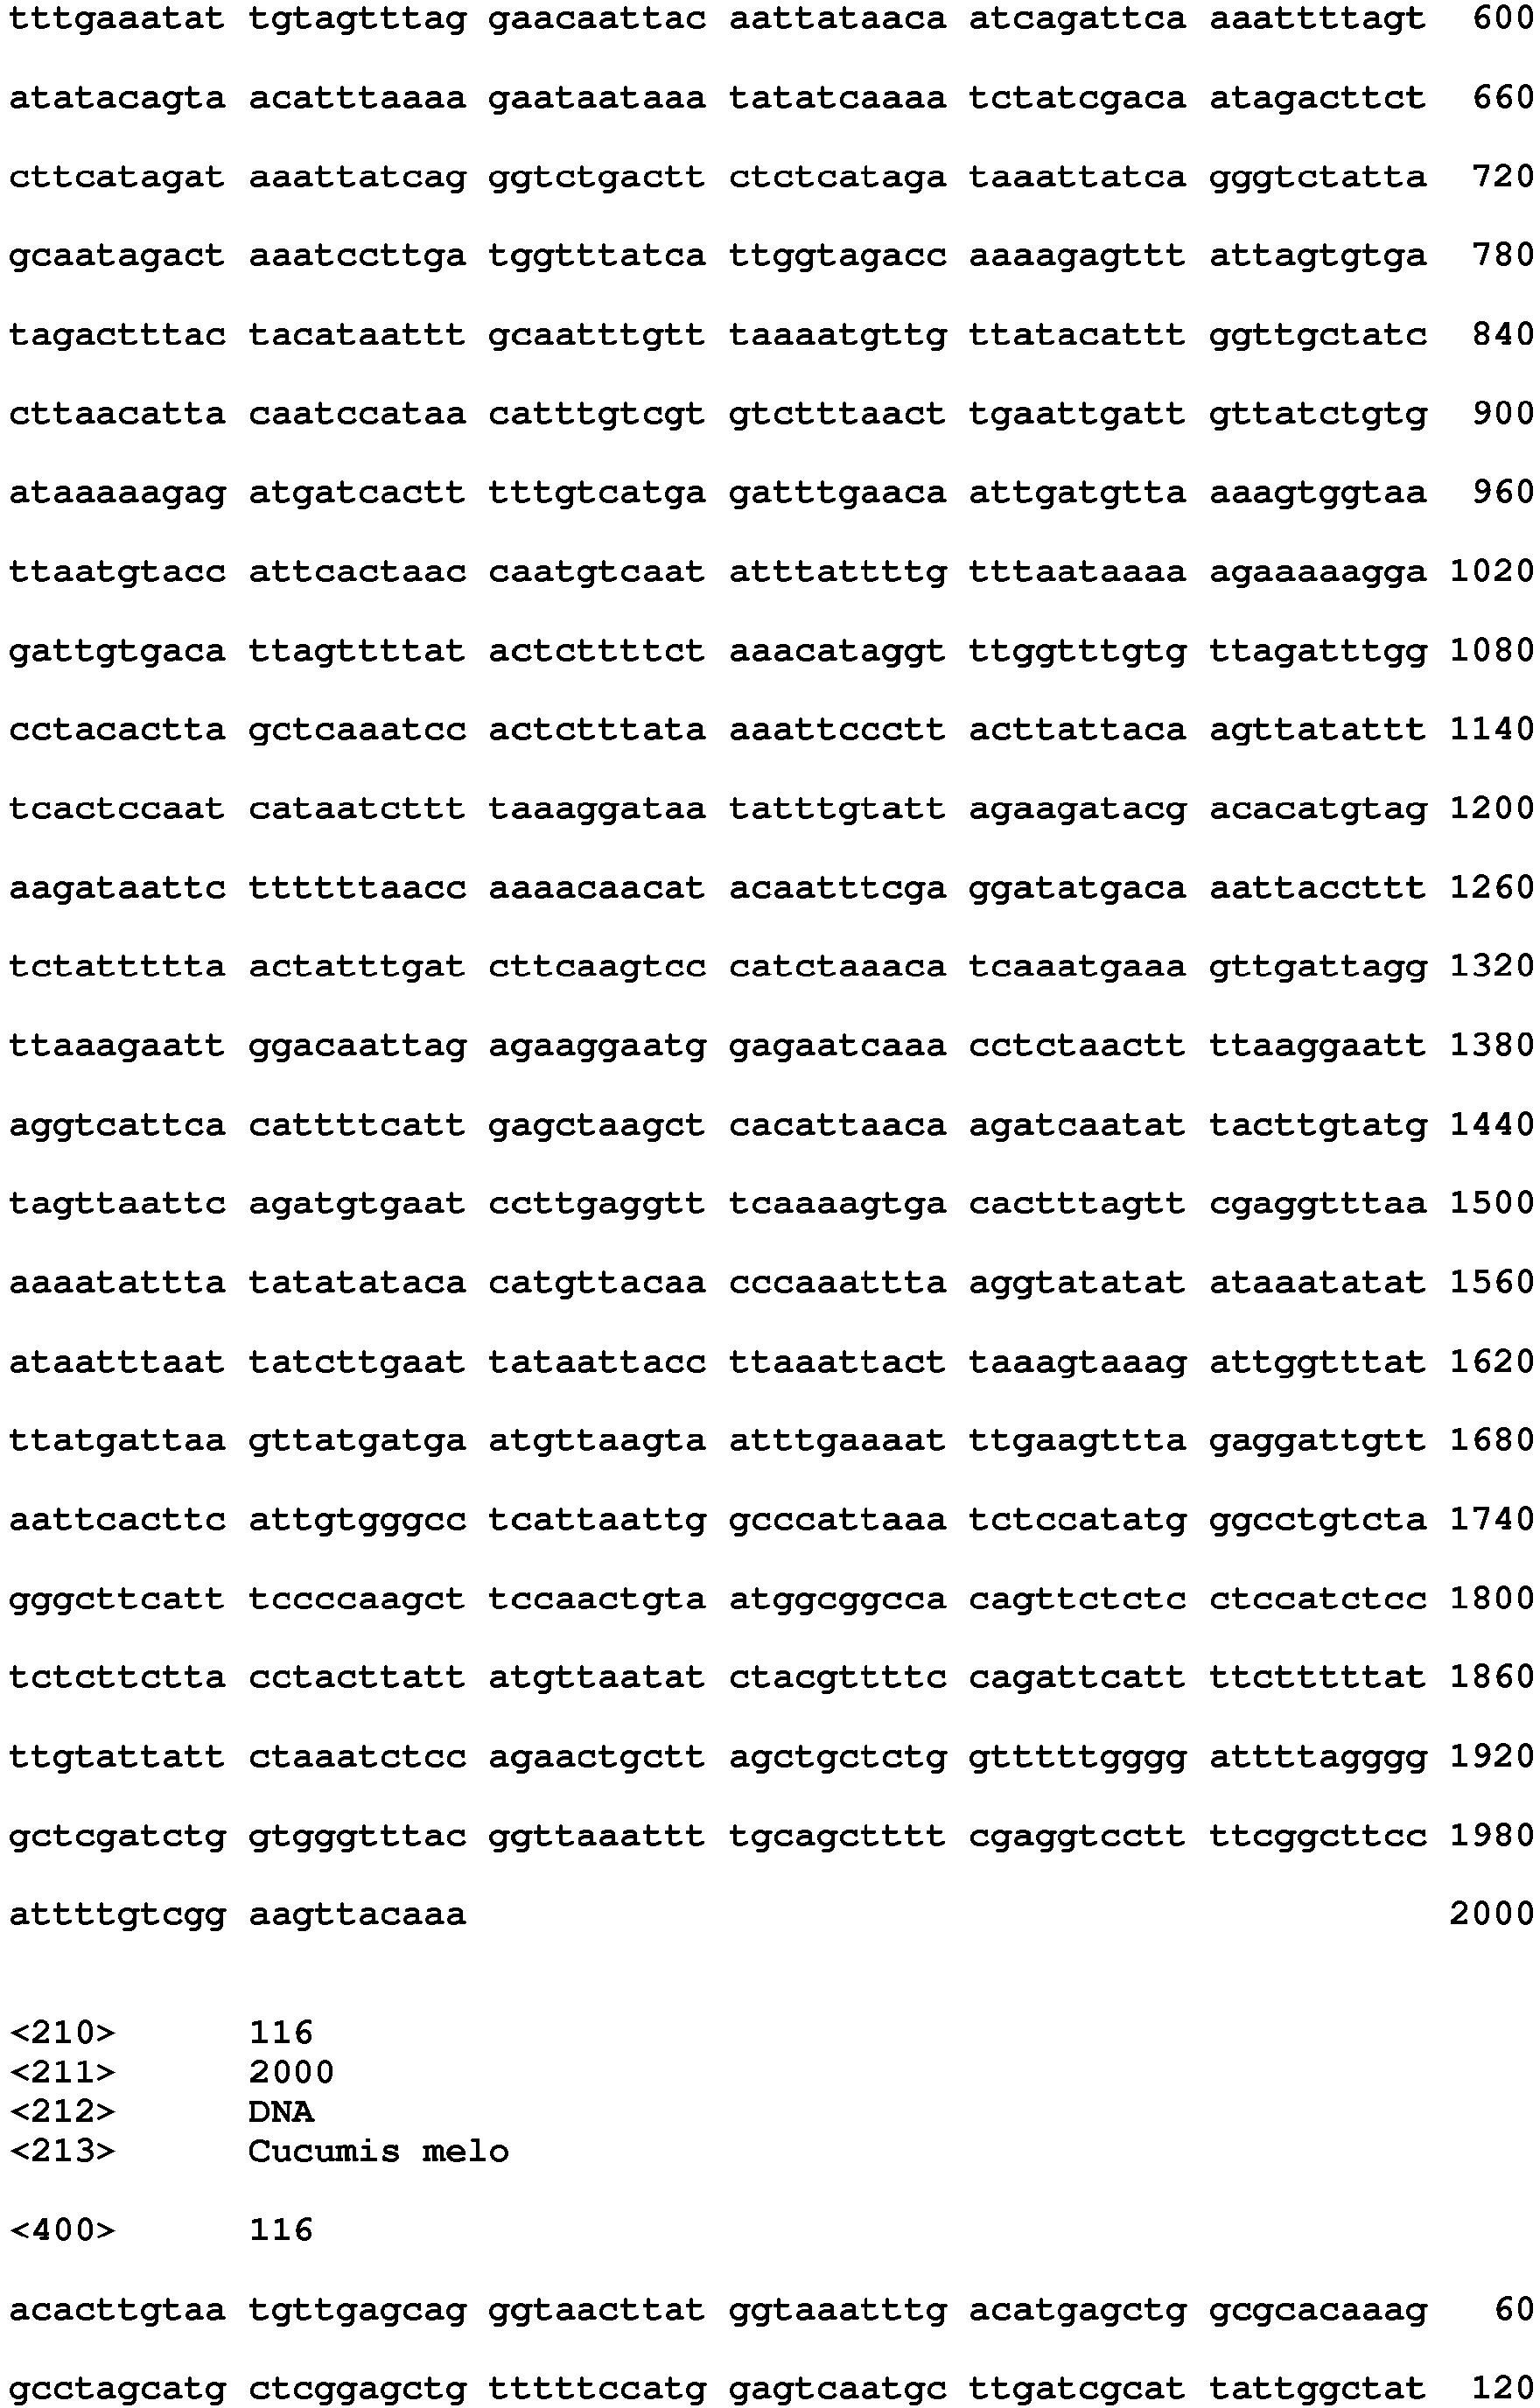 Figure imgb0145